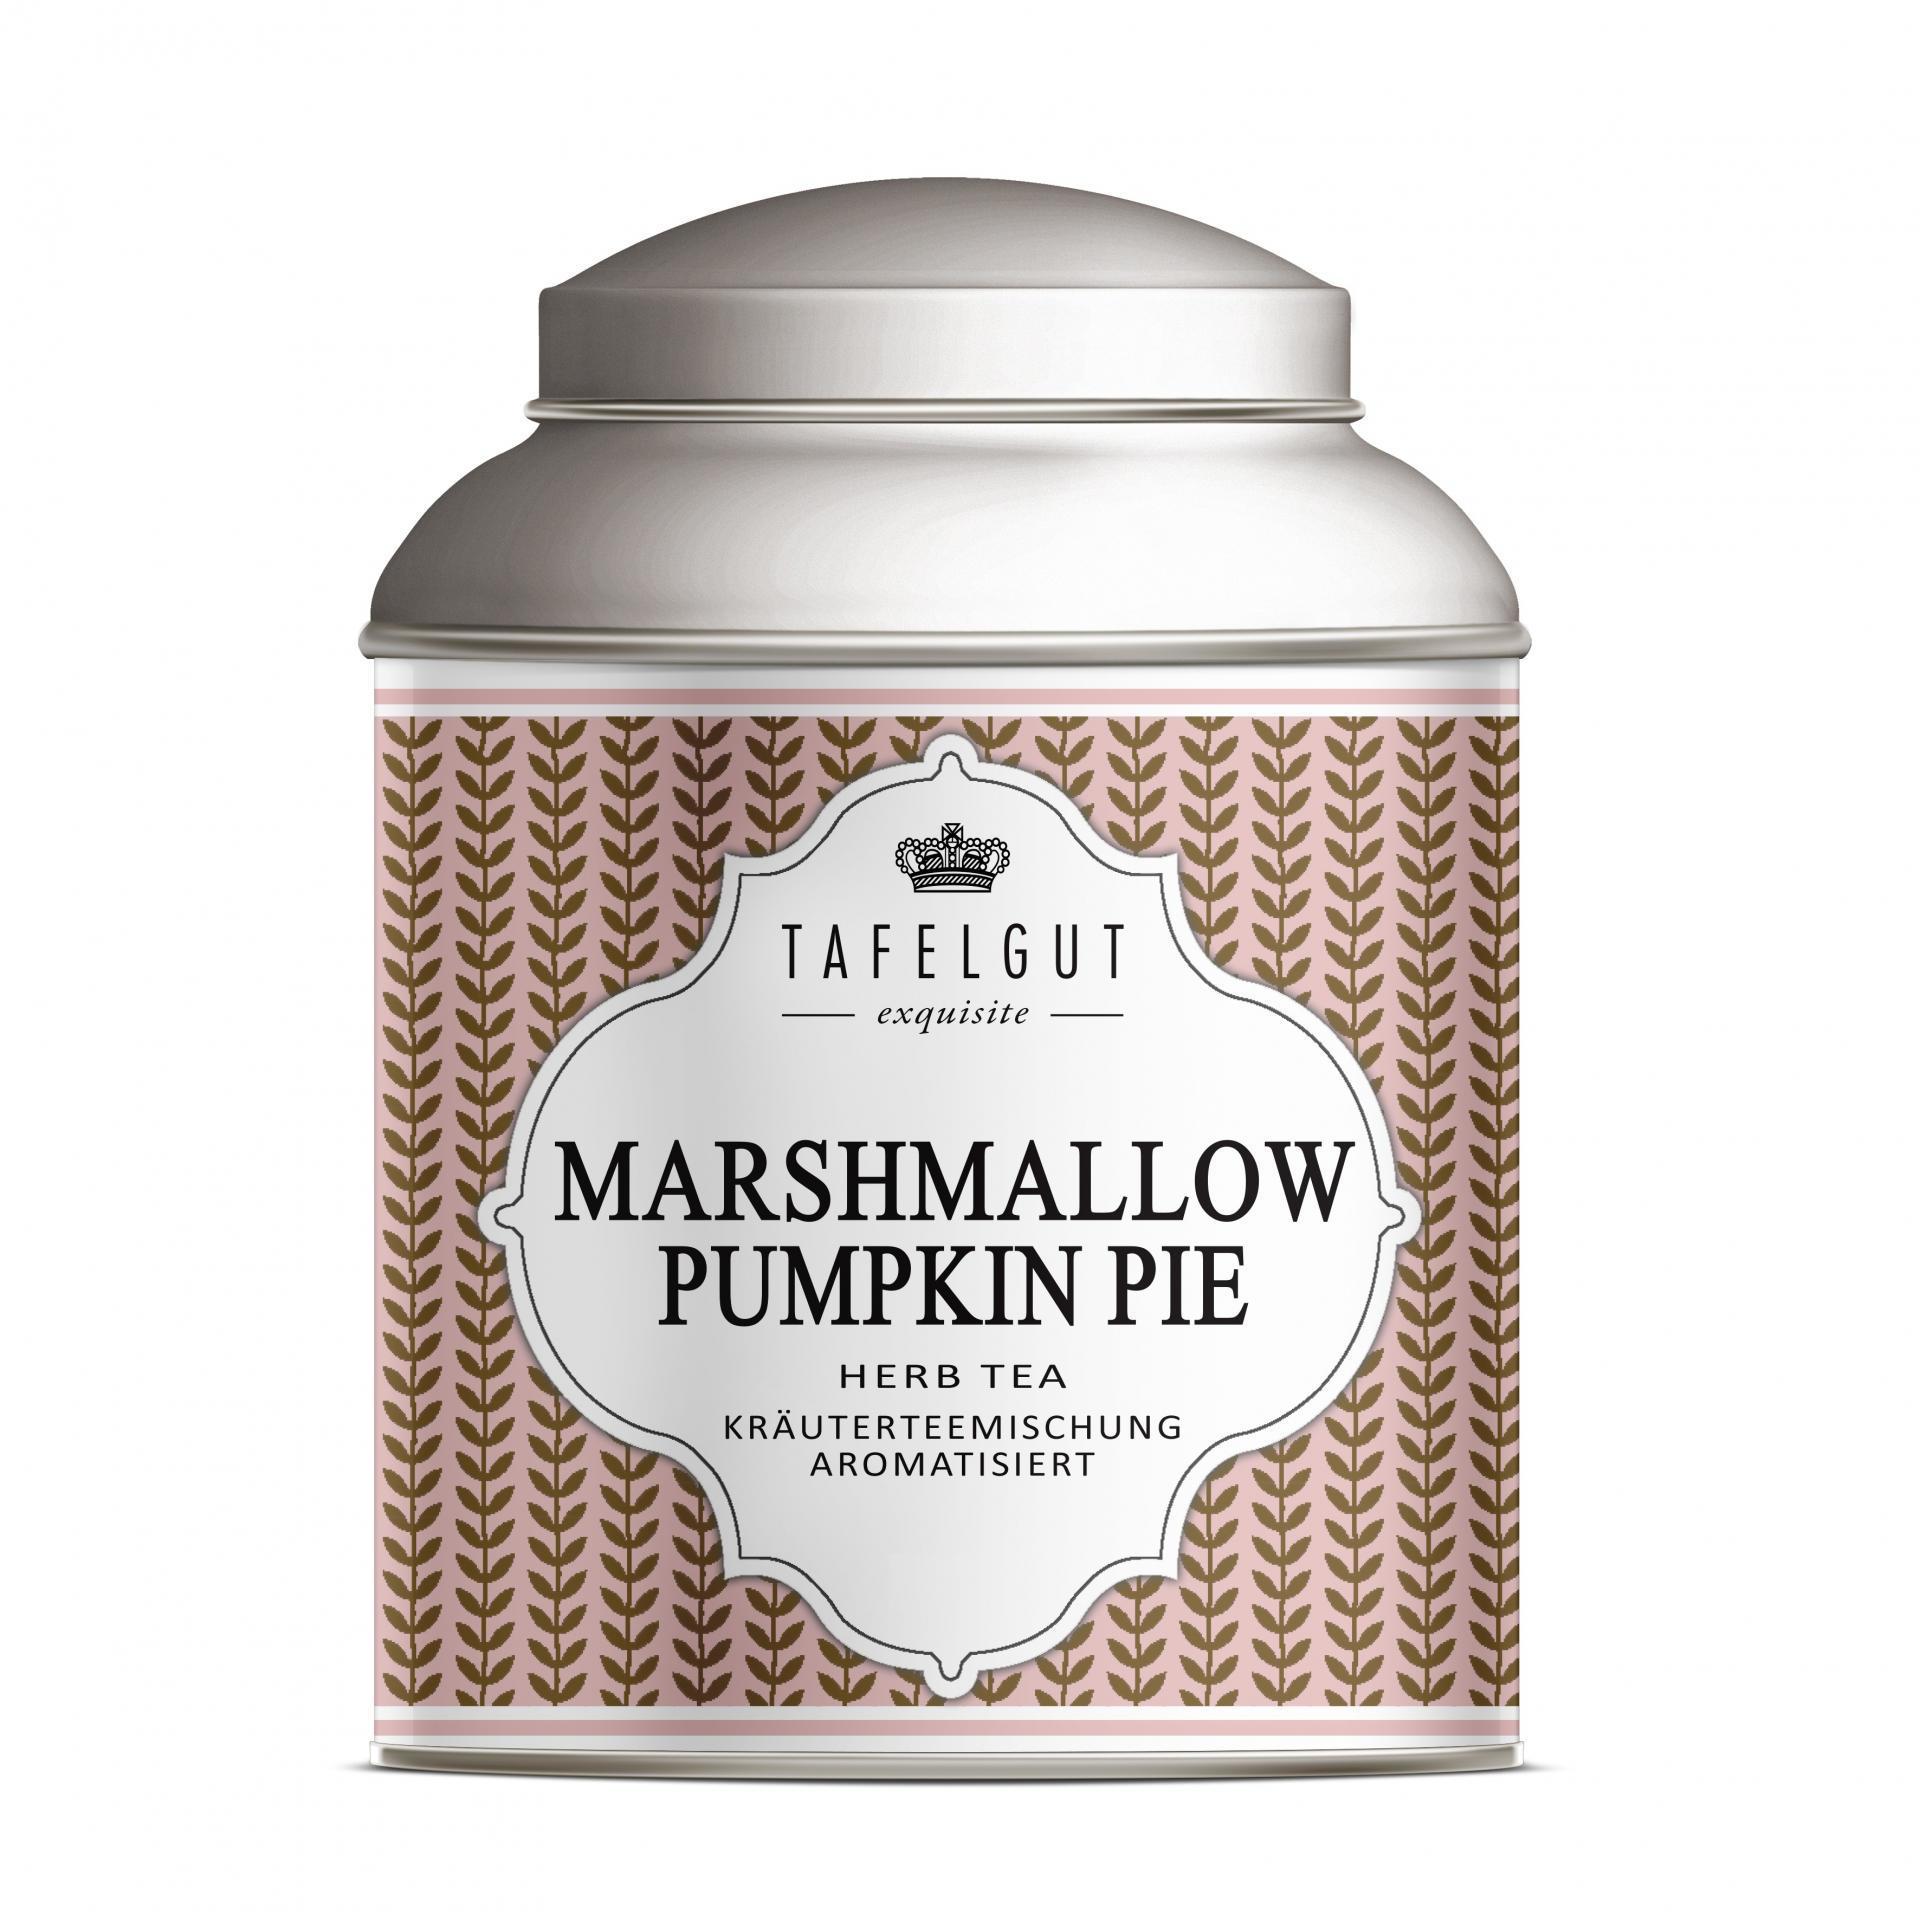 TAFELGUT Mini bylinný čaj Marshmallow Pumpkin Pie - 25gr, růžová barva, měděná barva, kov